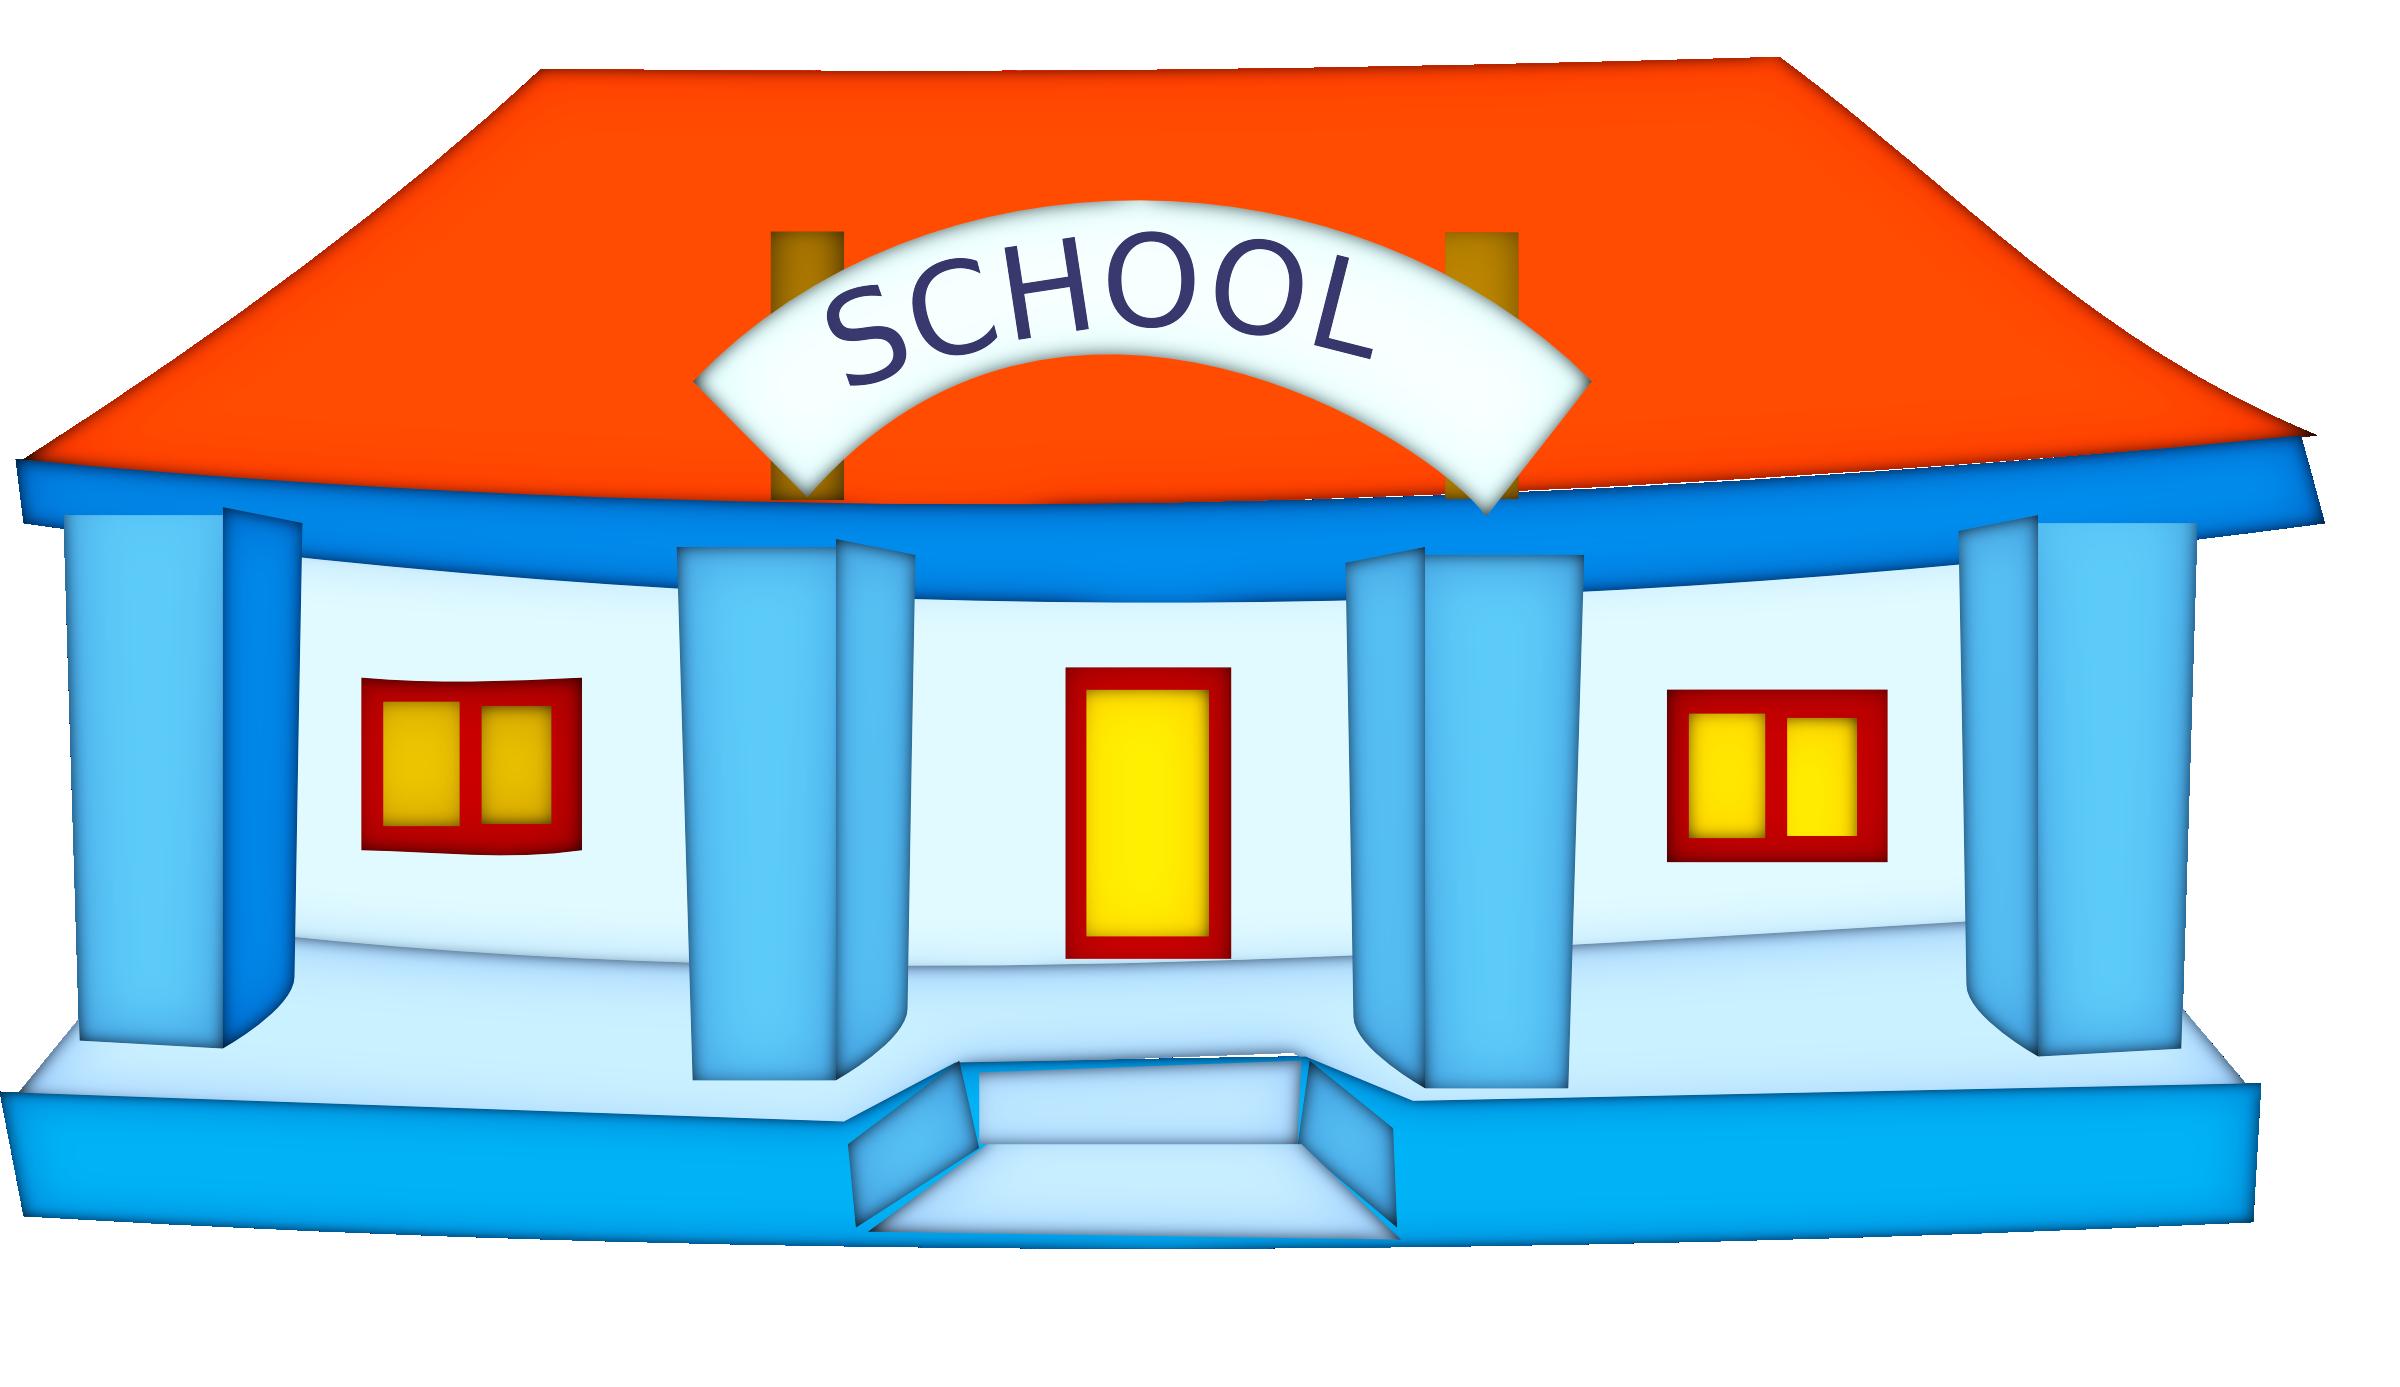 2400x1387 High Resolution School Clipart